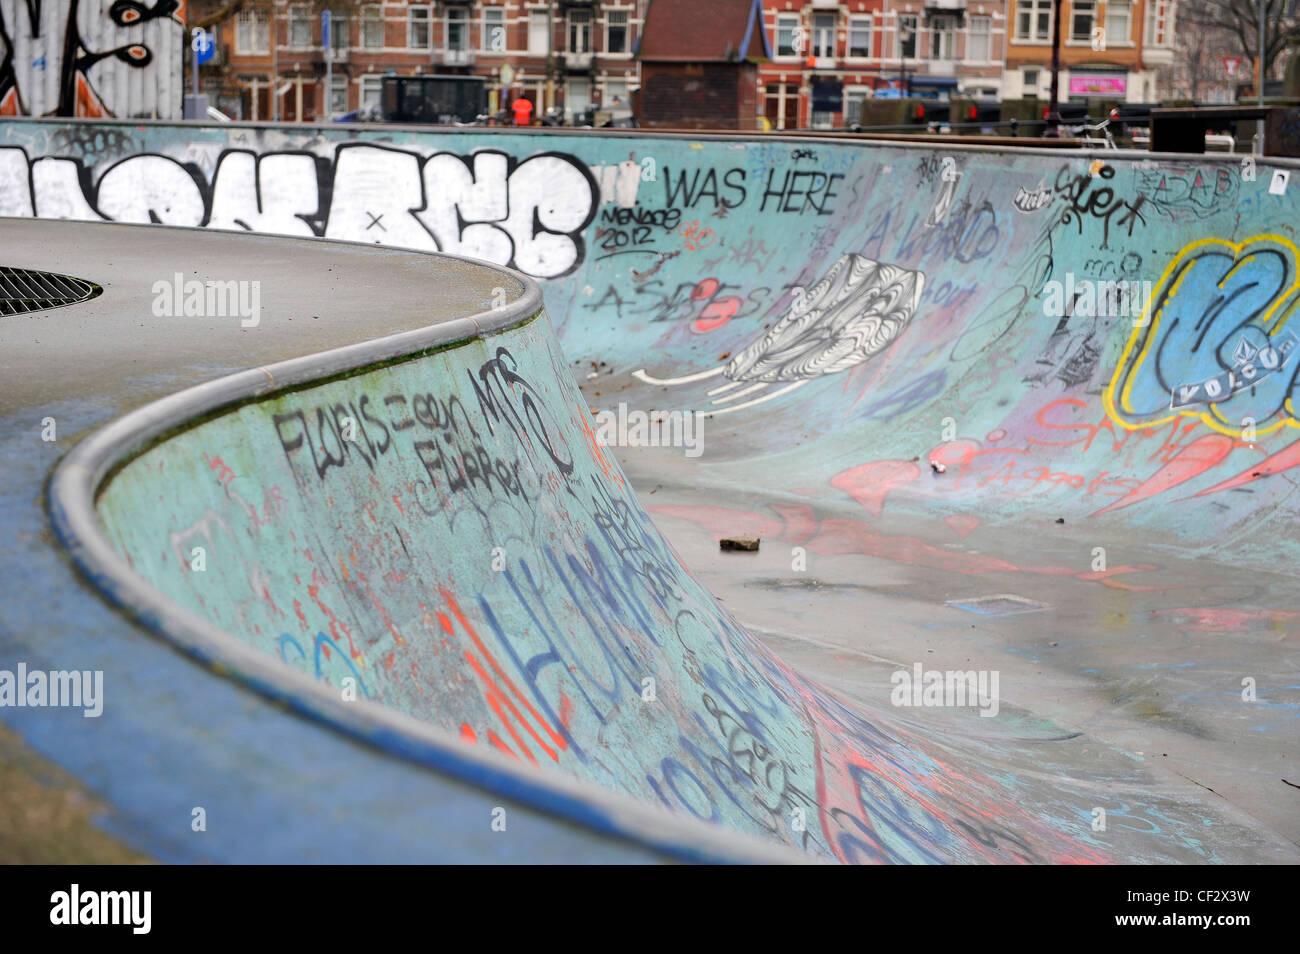 Graffiti wall amsterdam - Graffiti On The Walls Of A Bowl In A Skatepark Amsterdam Netherlands